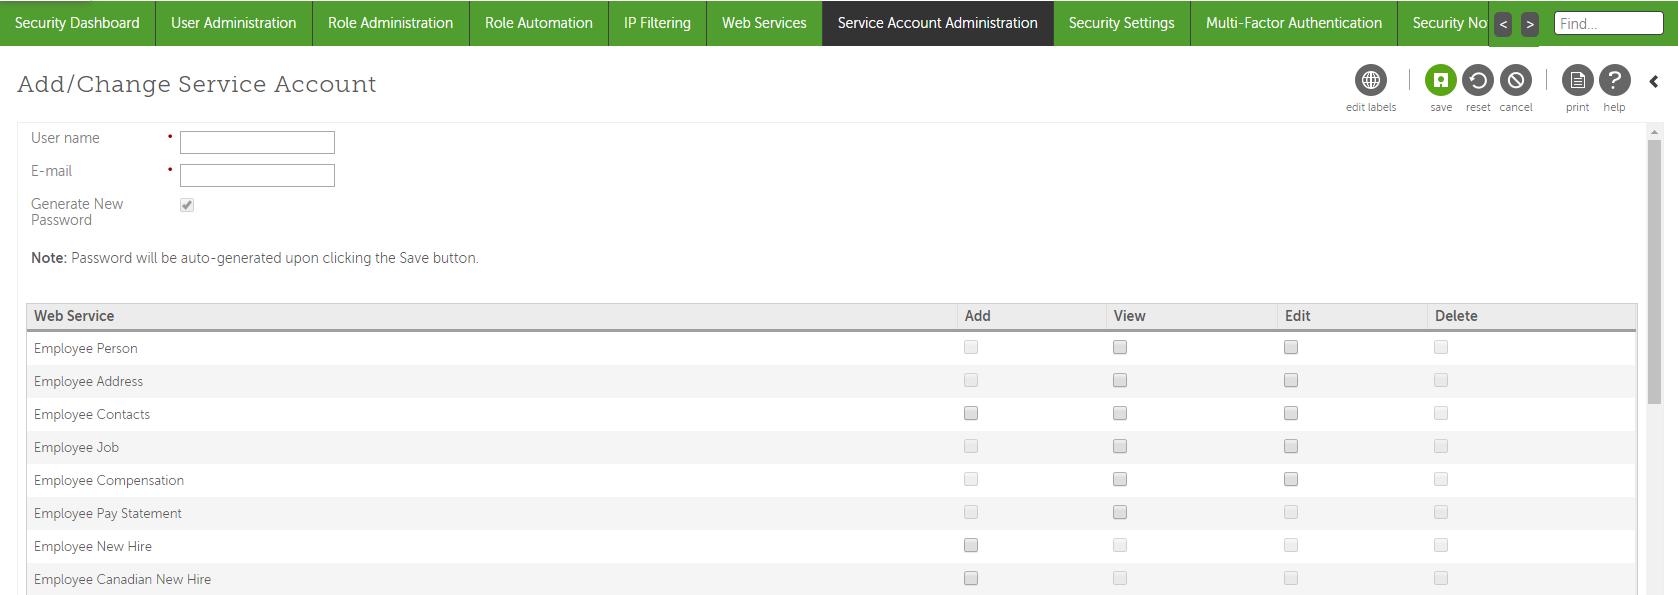 Add a Service Account